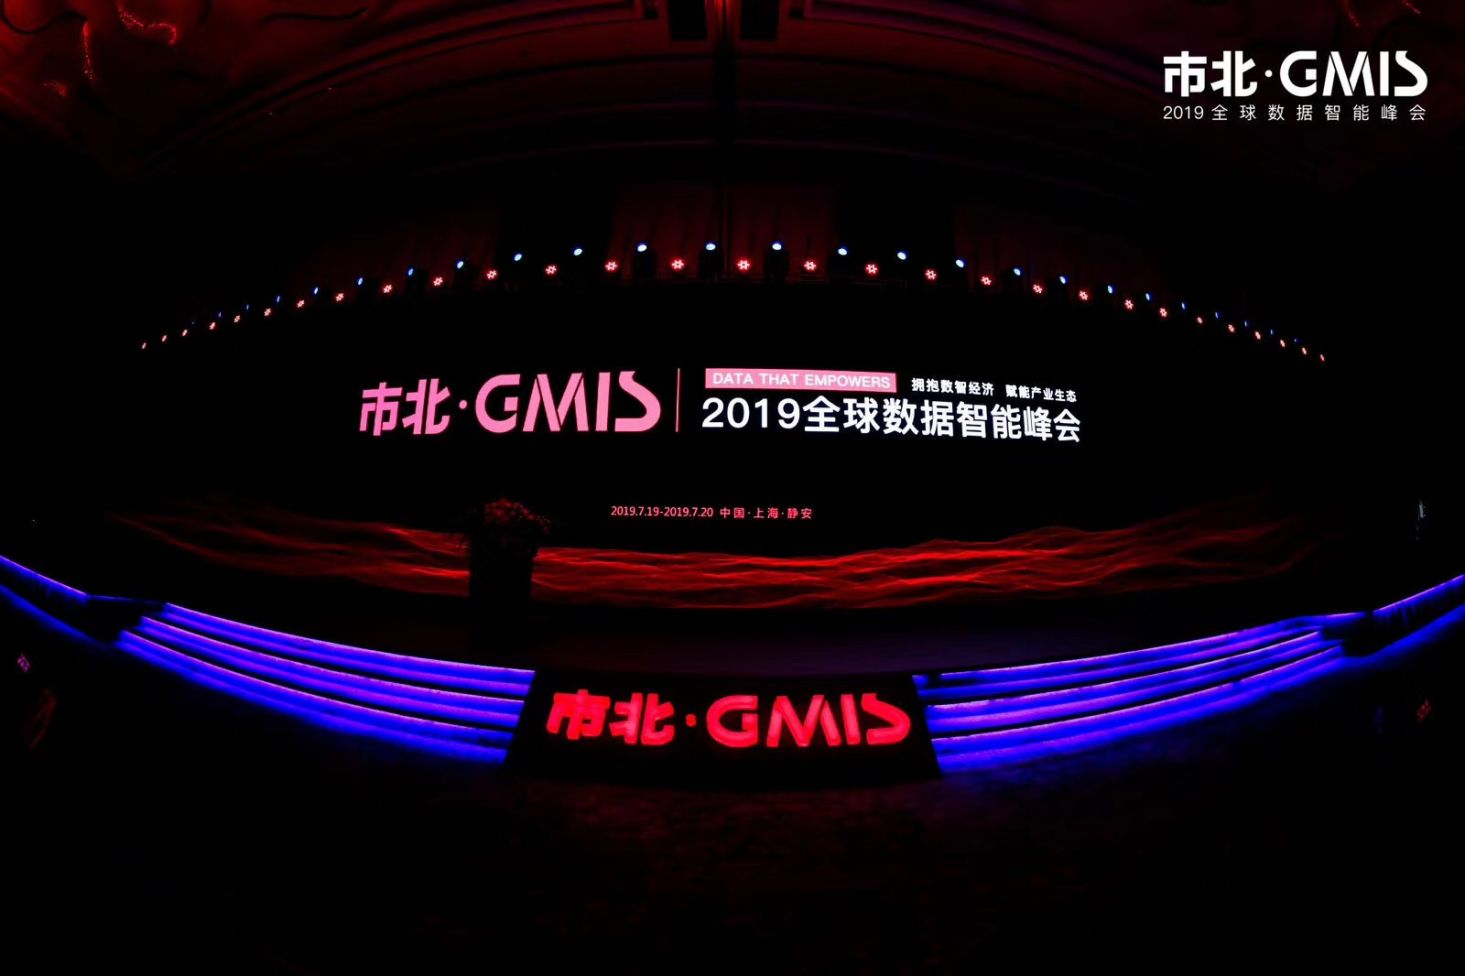 Shibei·GMIS 2019